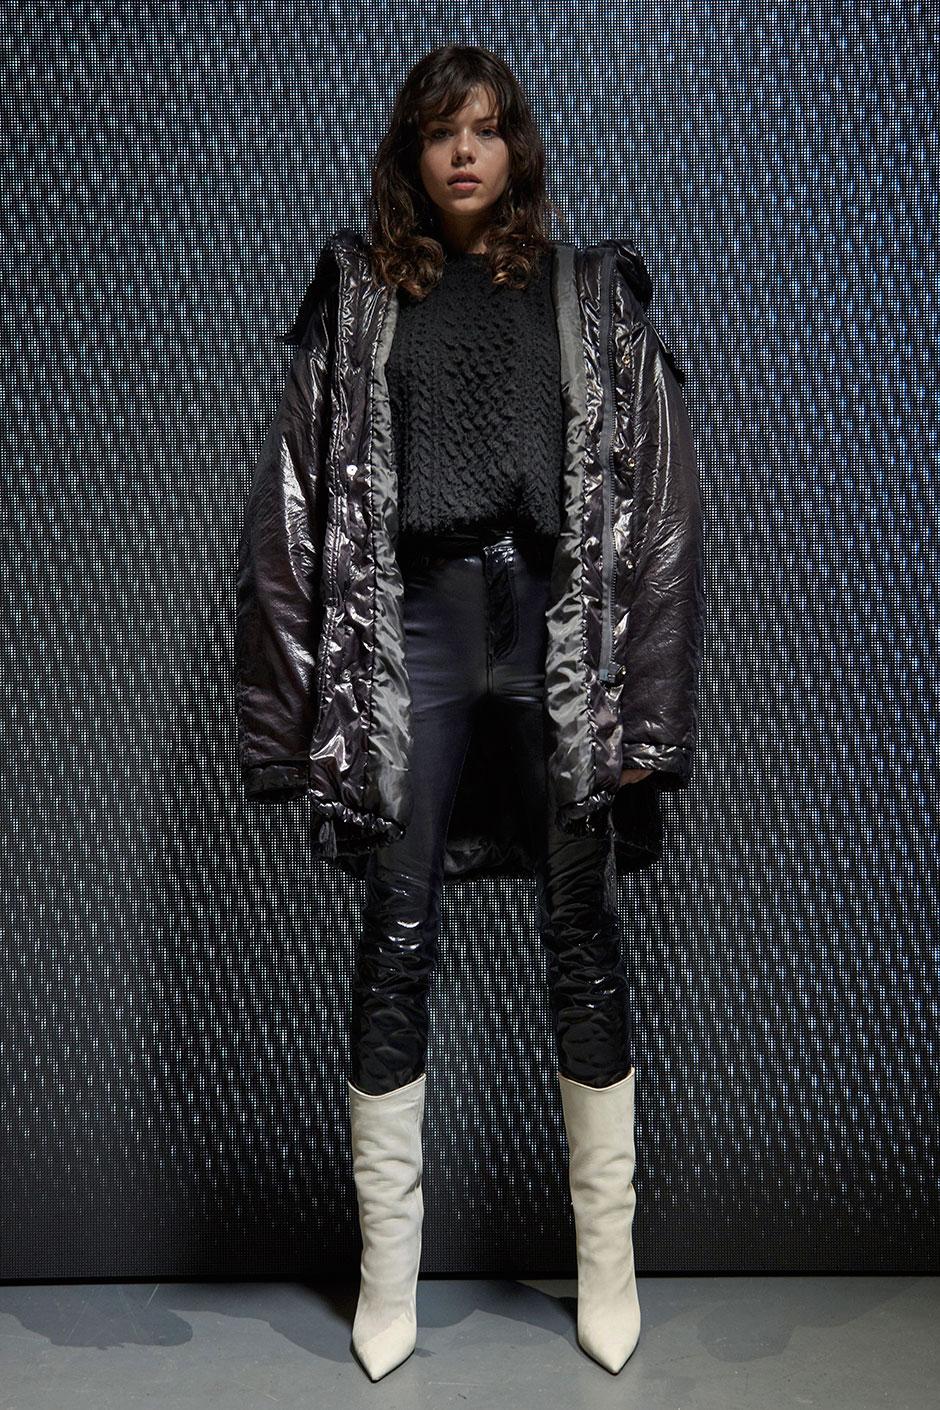 wholesale dealer 47993 d6235 Complete Yeezy Season 5 Clothing/Footwear Recap ...